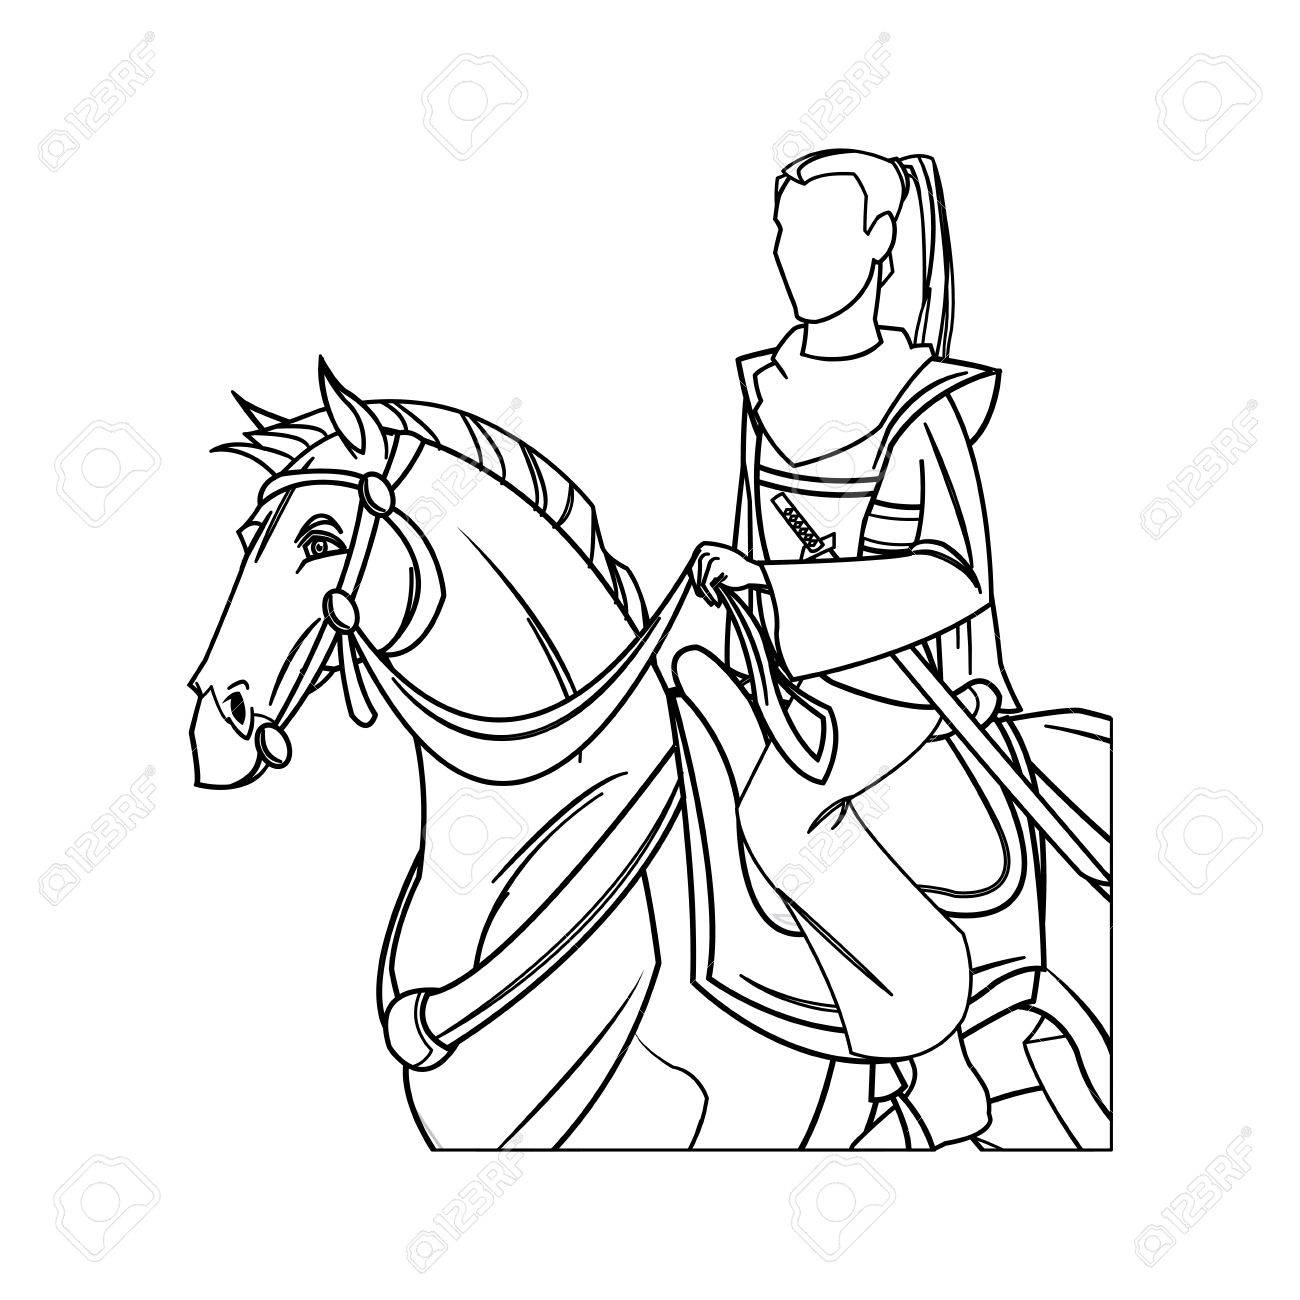 1300x1300 Warrior Samurai Japanese Character Riding Horse Vector